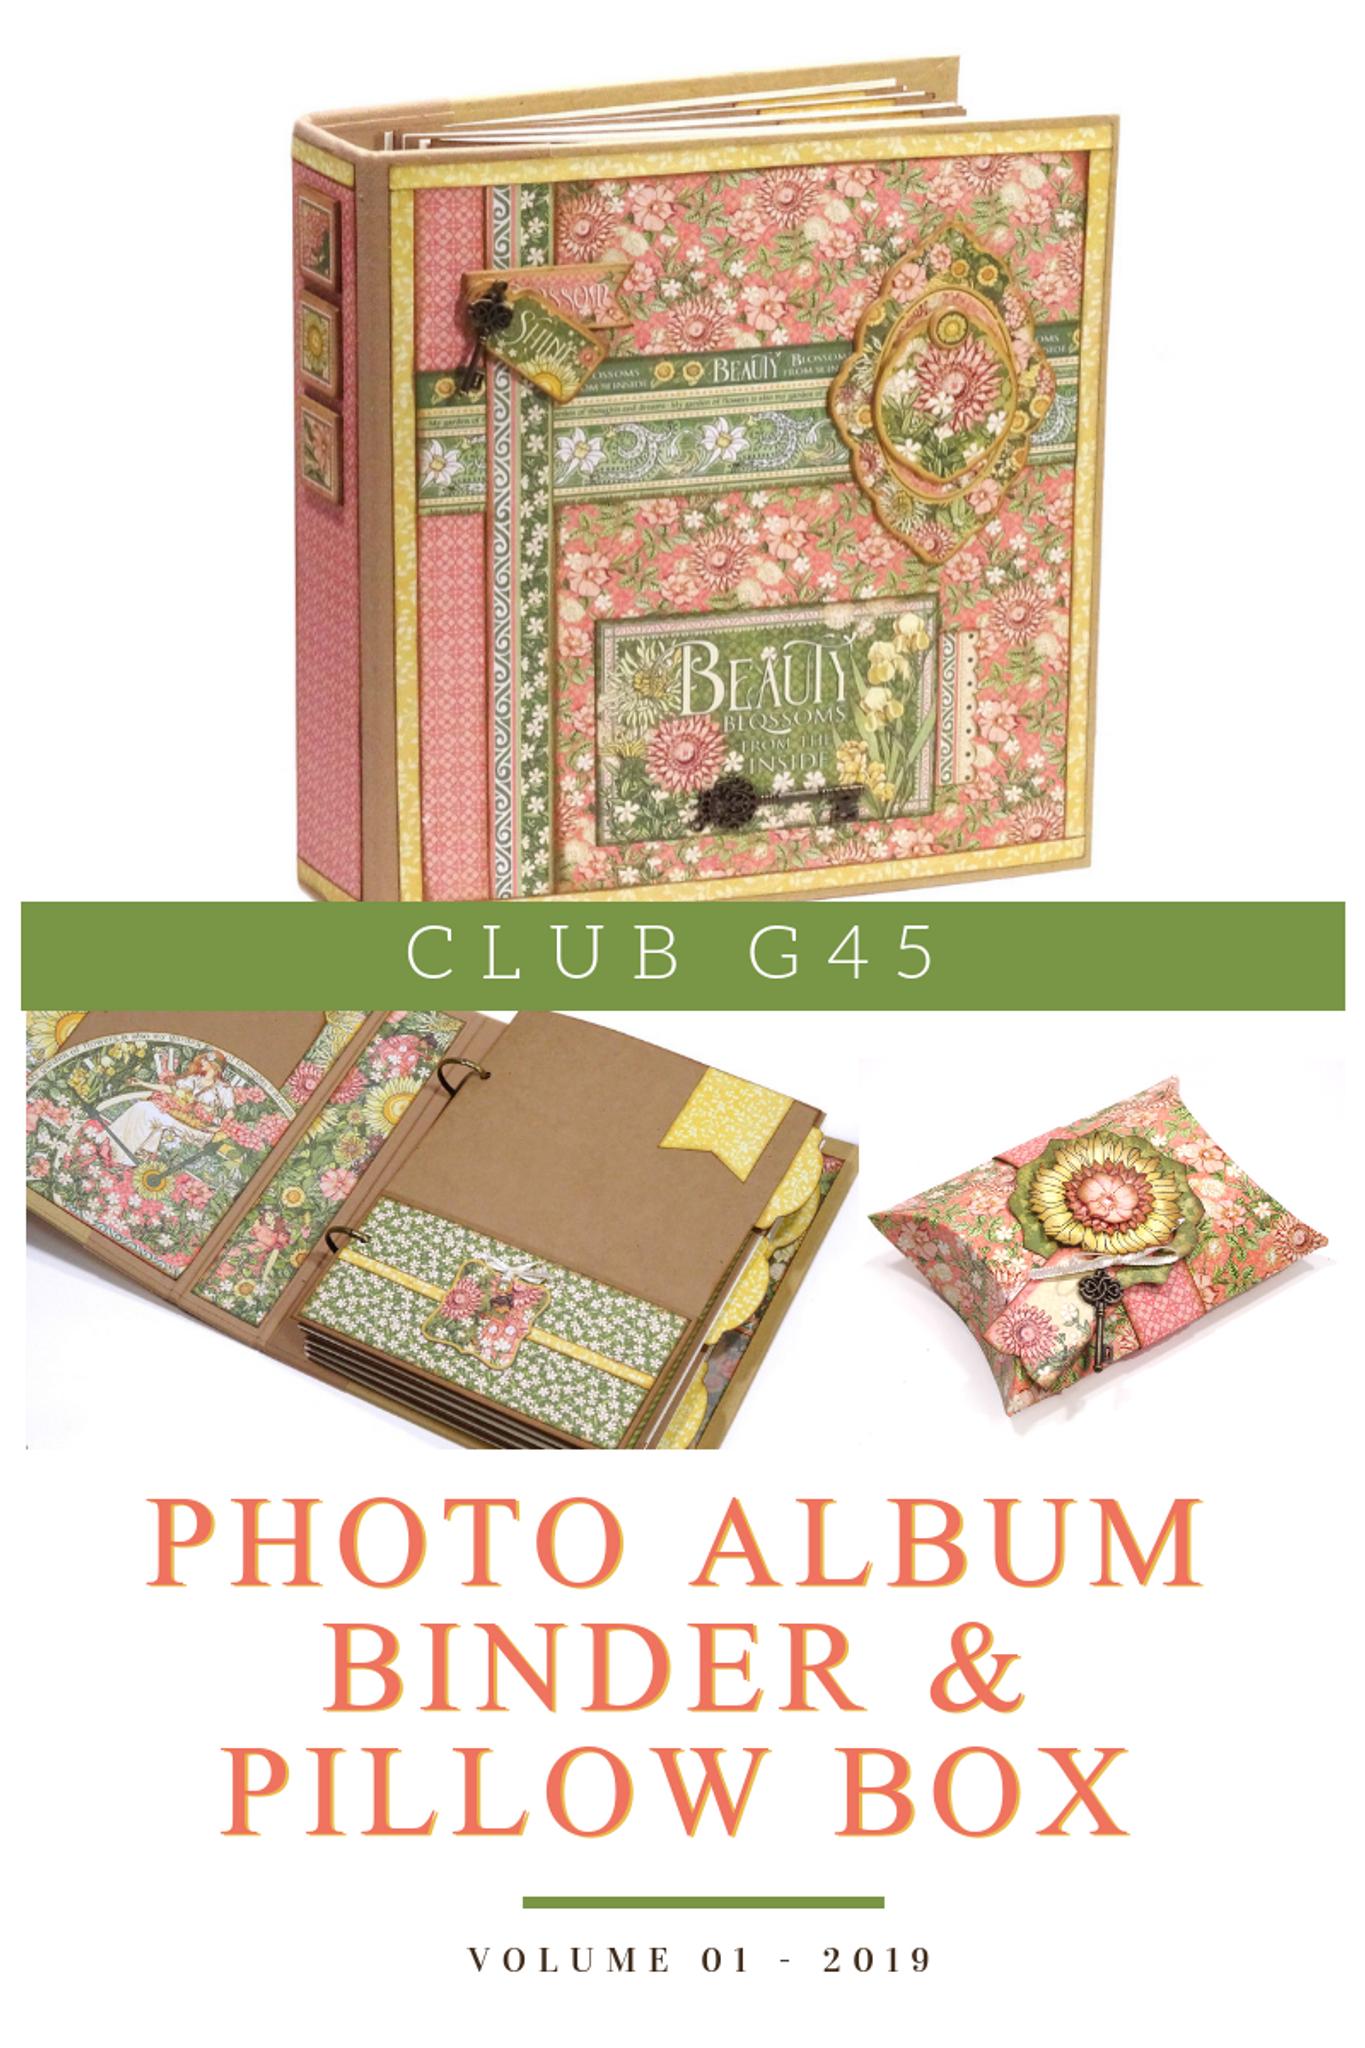 Club G45 Vol 01 January 2019 - Garden Goddess - Photo Album ...